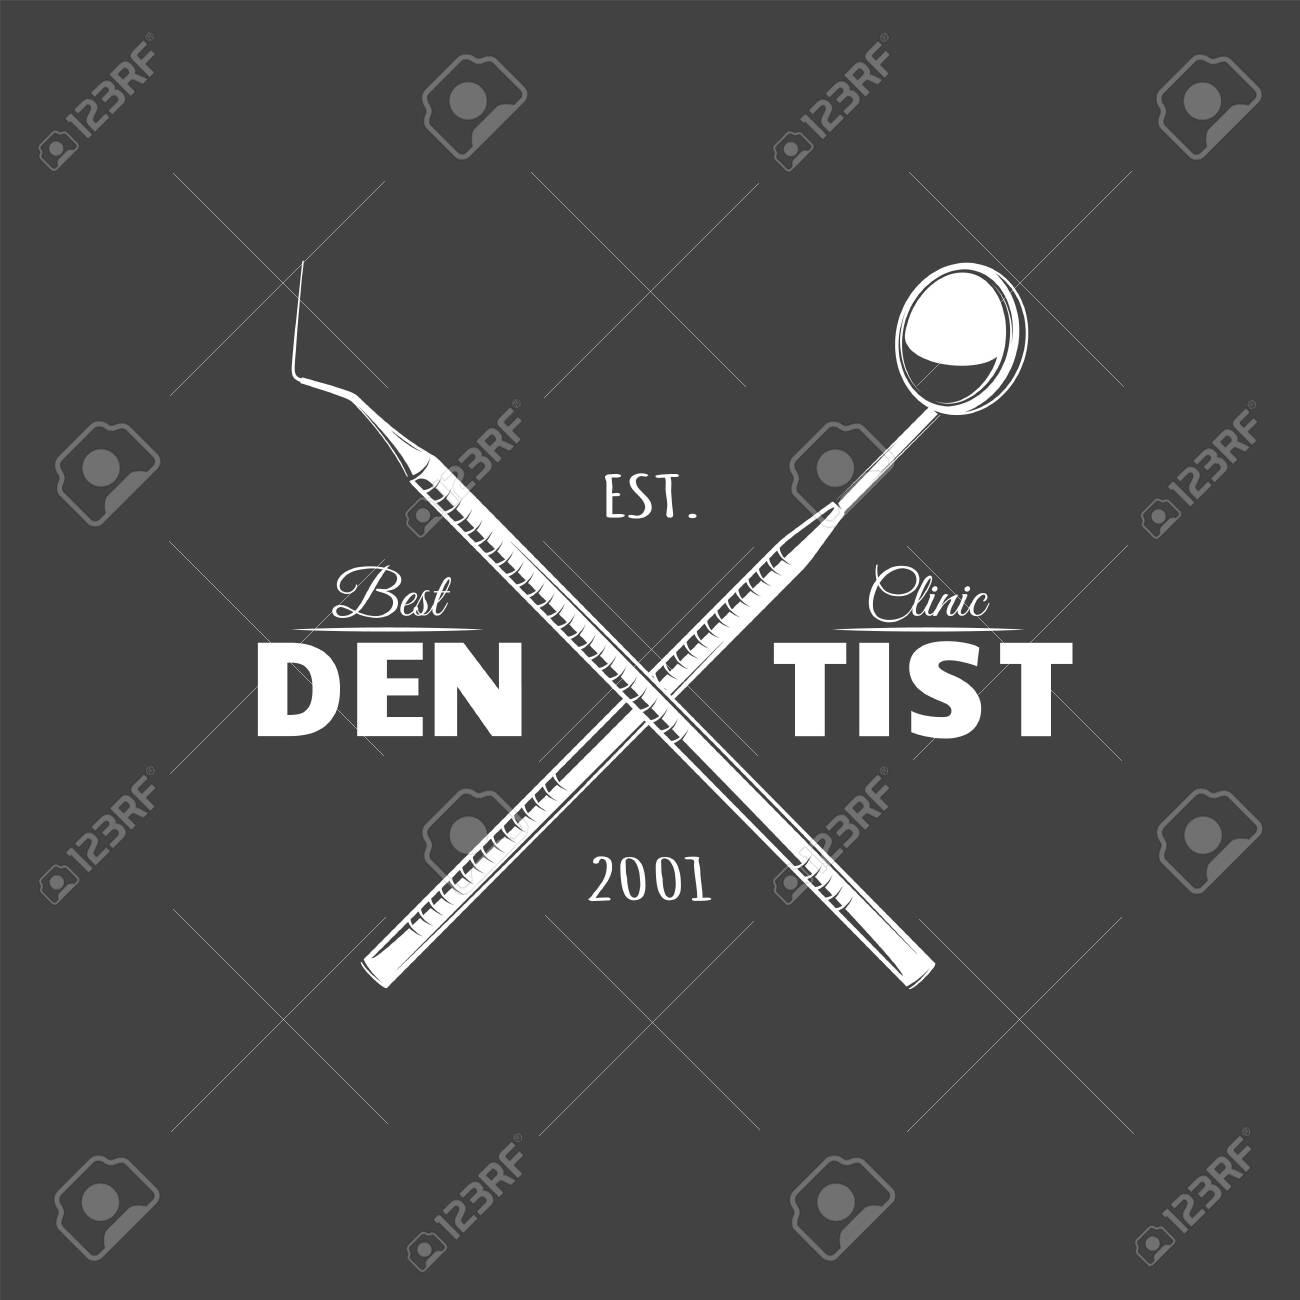 Dentist Tools Clipart - Dental Instruments Png - Free Transparent PNG  Clipart Images Download